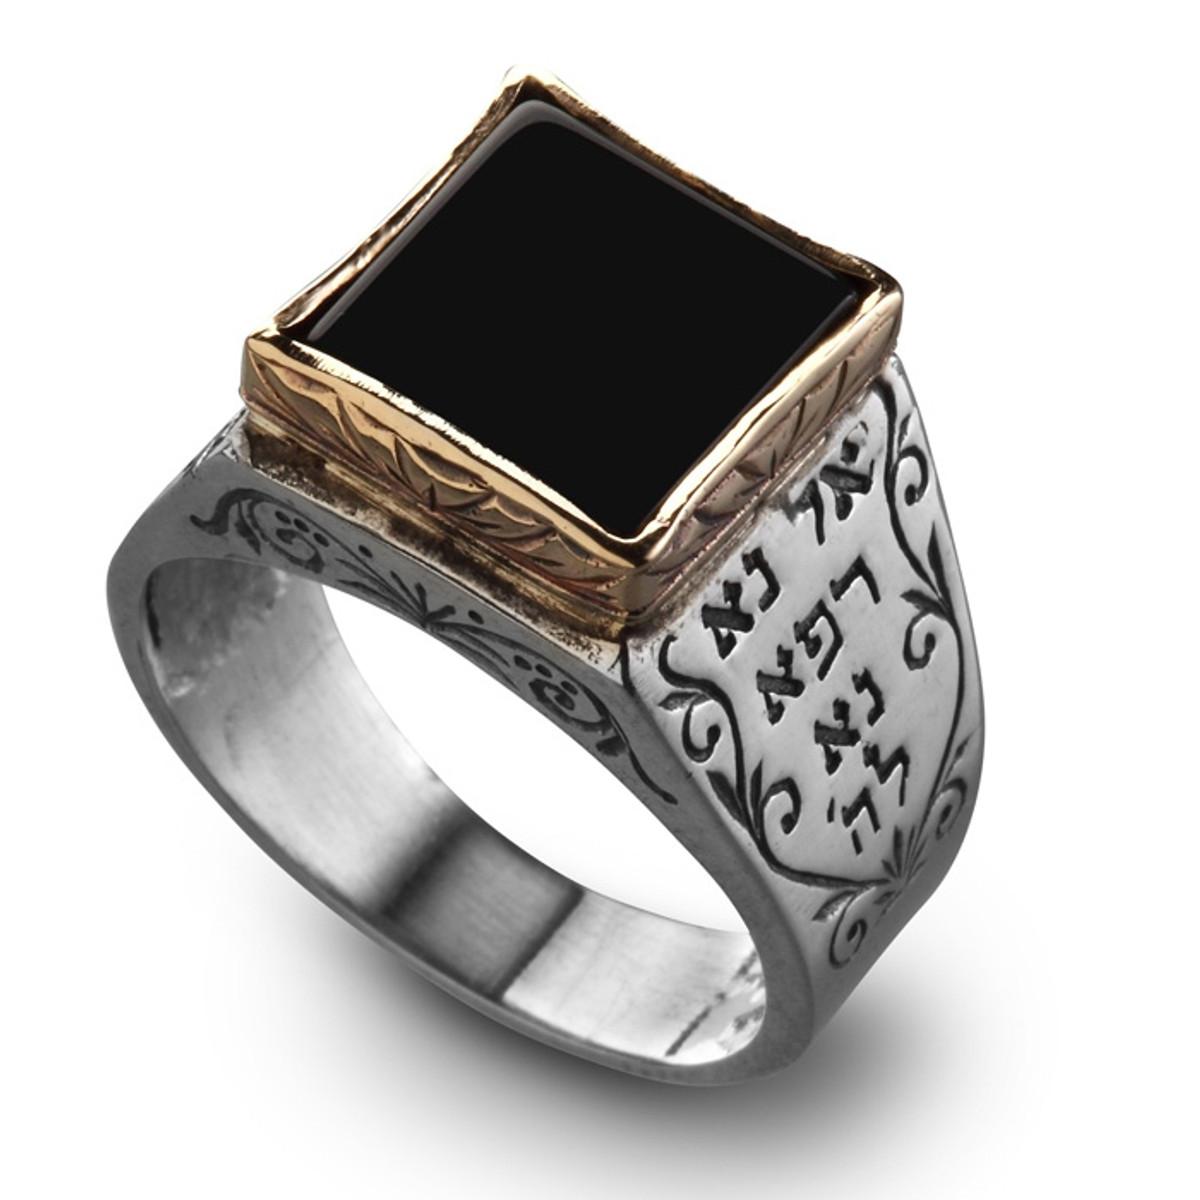 Haari Raphael 5 Metals Kabbalah Ring with Onyx